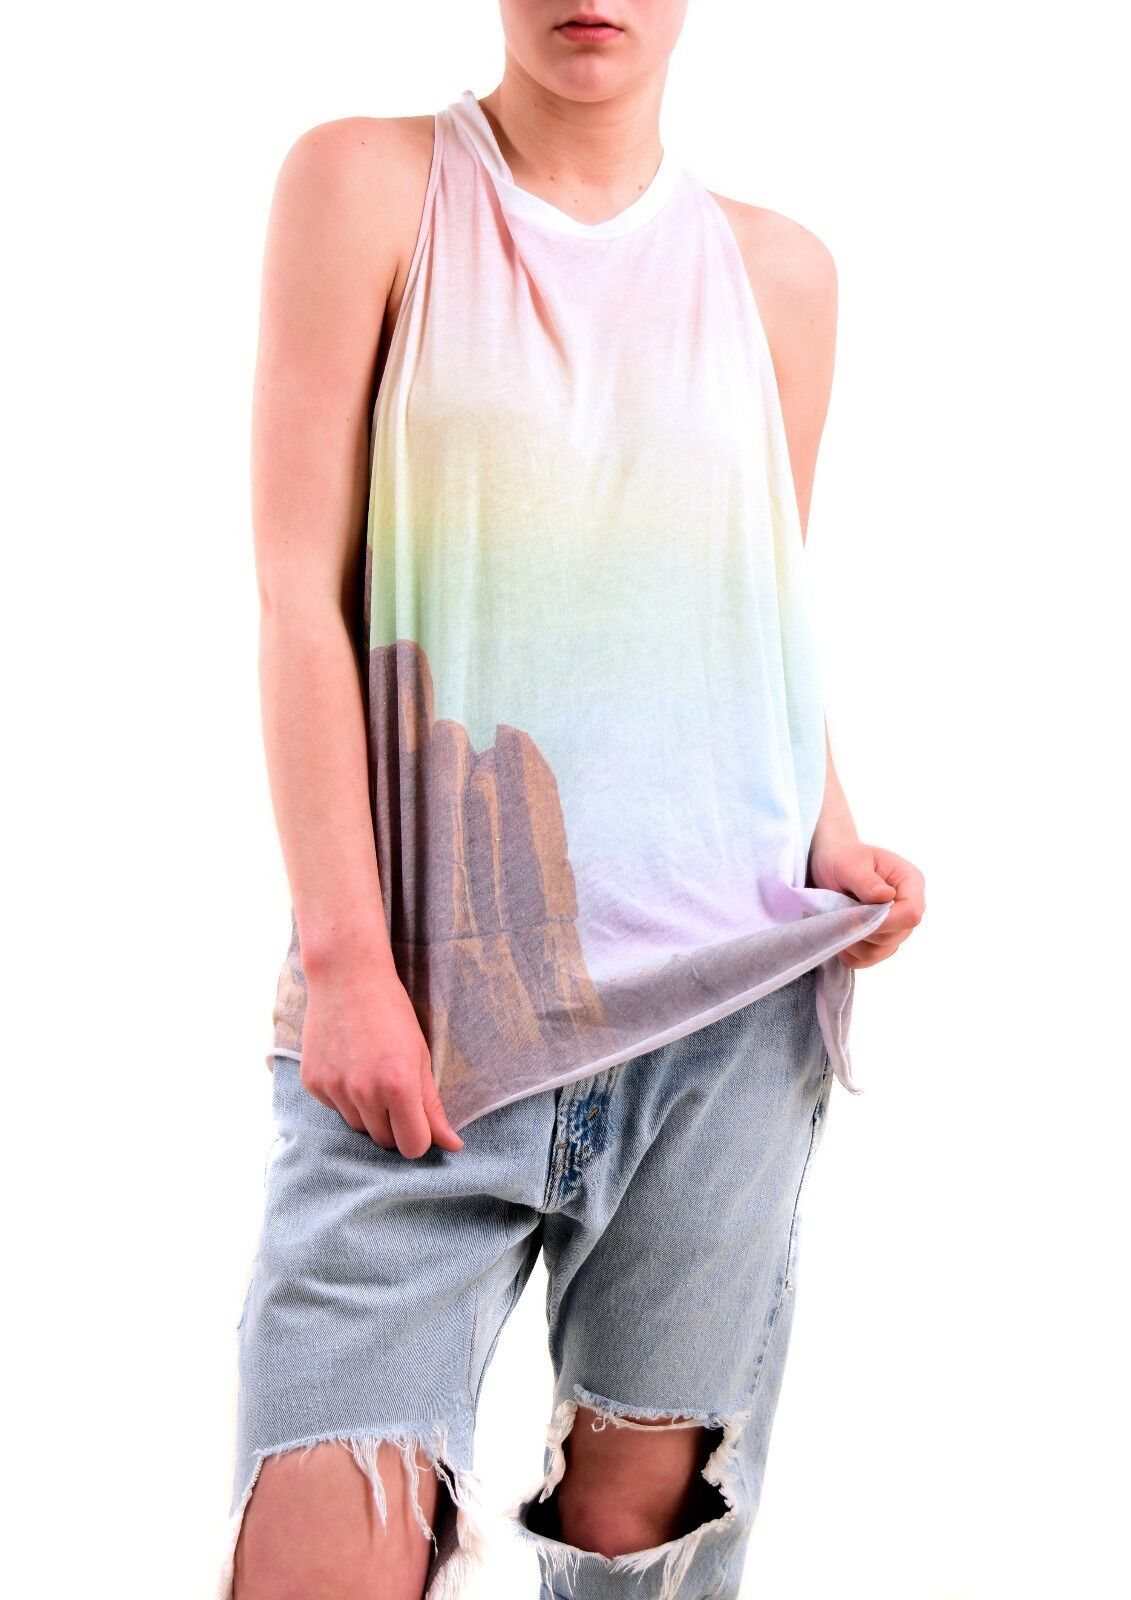 Wildfox Women's Rainbow Mountain Vest Top Tee Multi color Size S